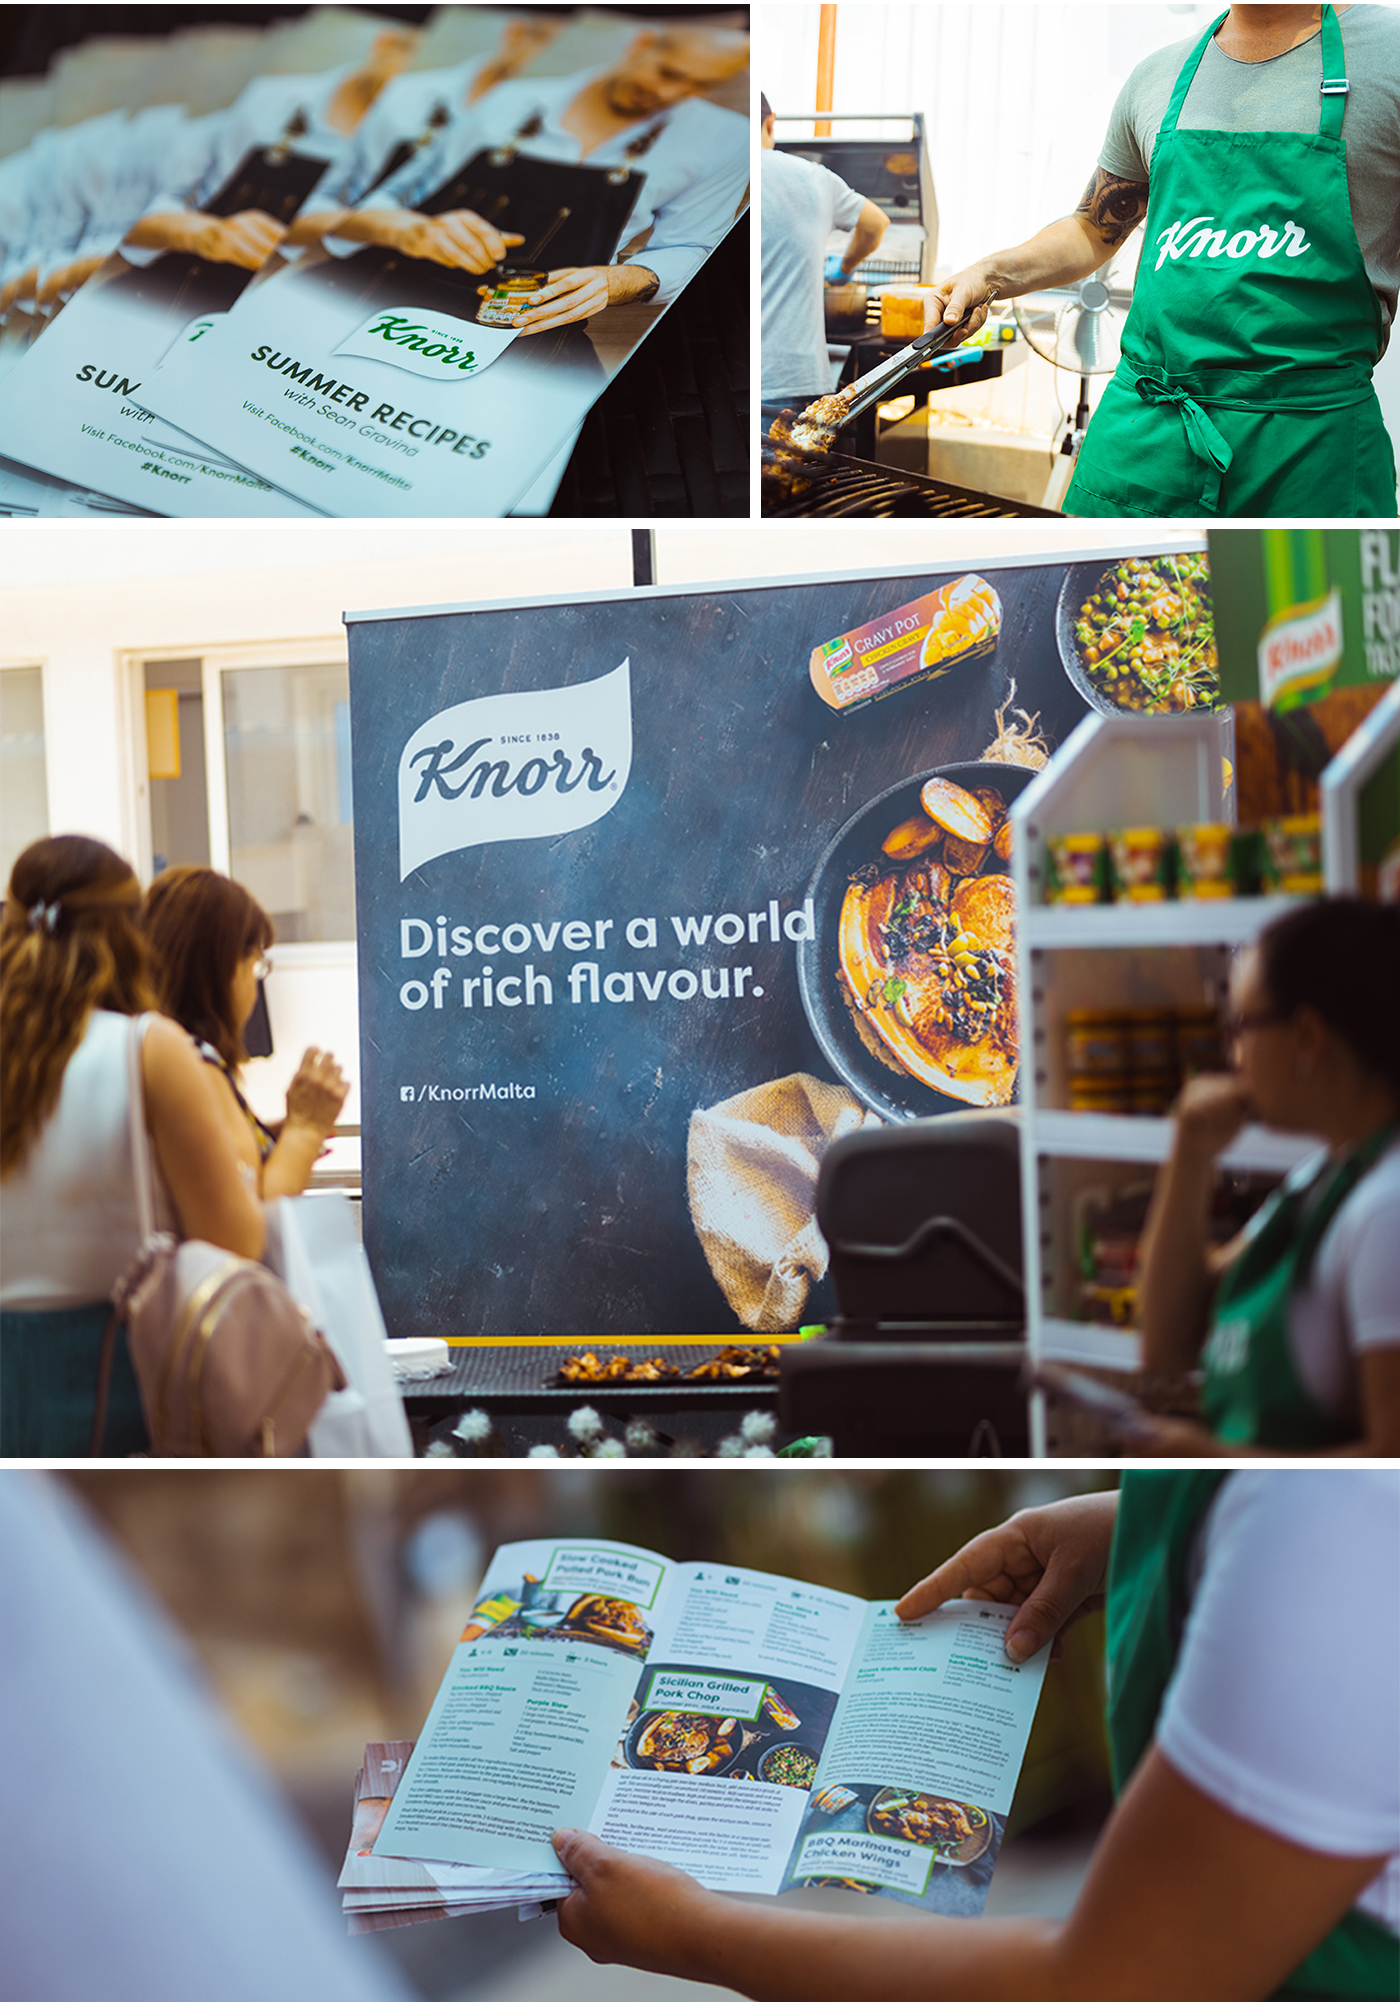 Knorr-Sean-Gravina-x-CS_BH_09 case study